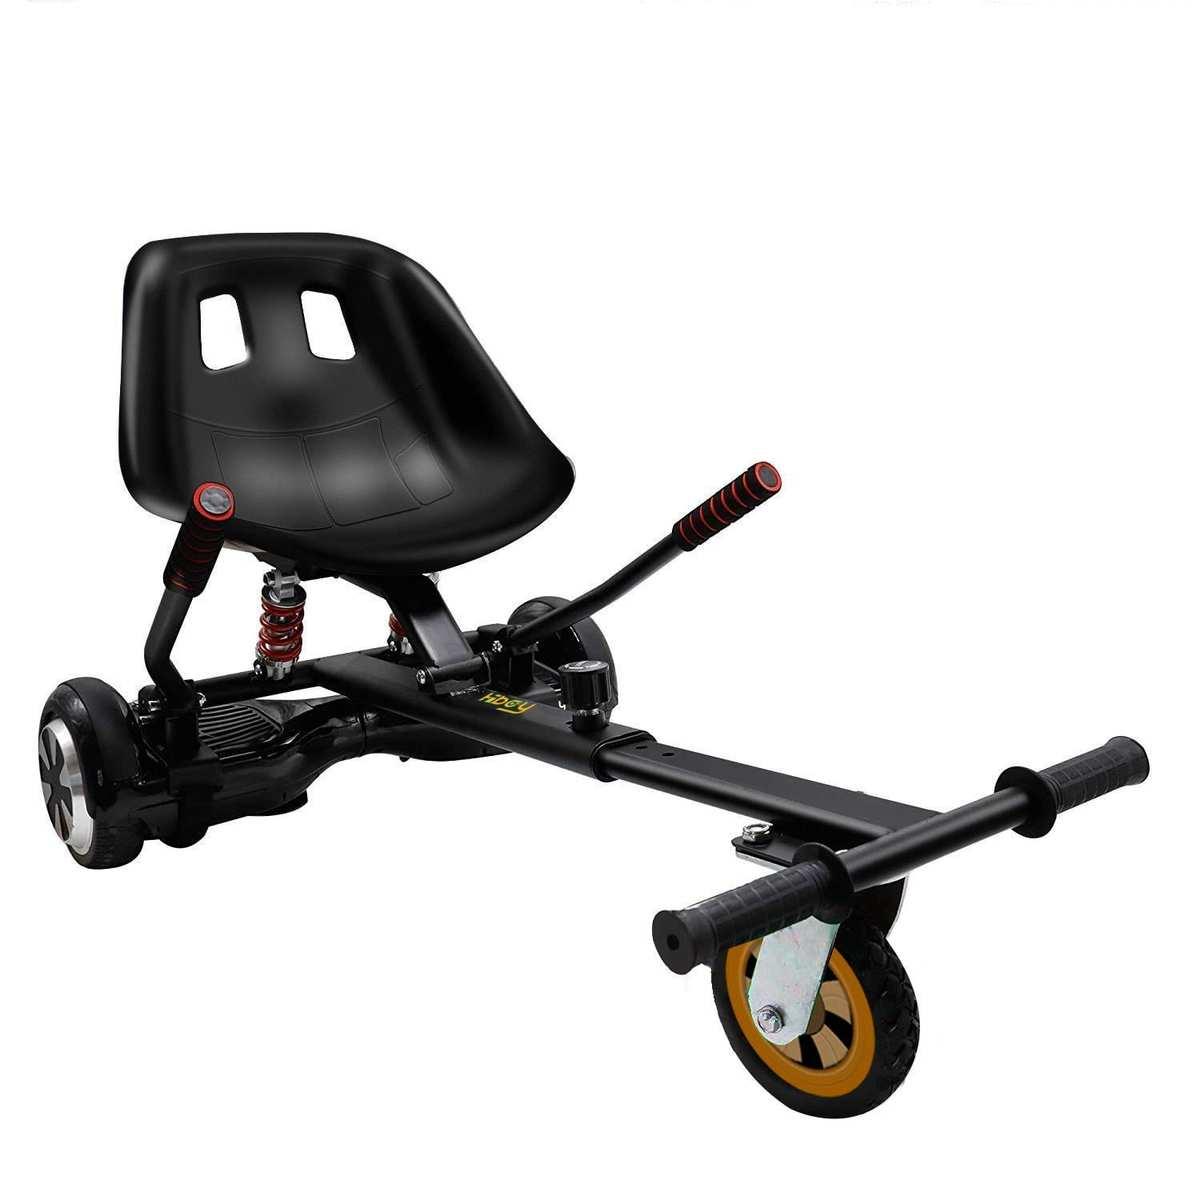 Hiboy HC-02 Hoverboard Go Cart